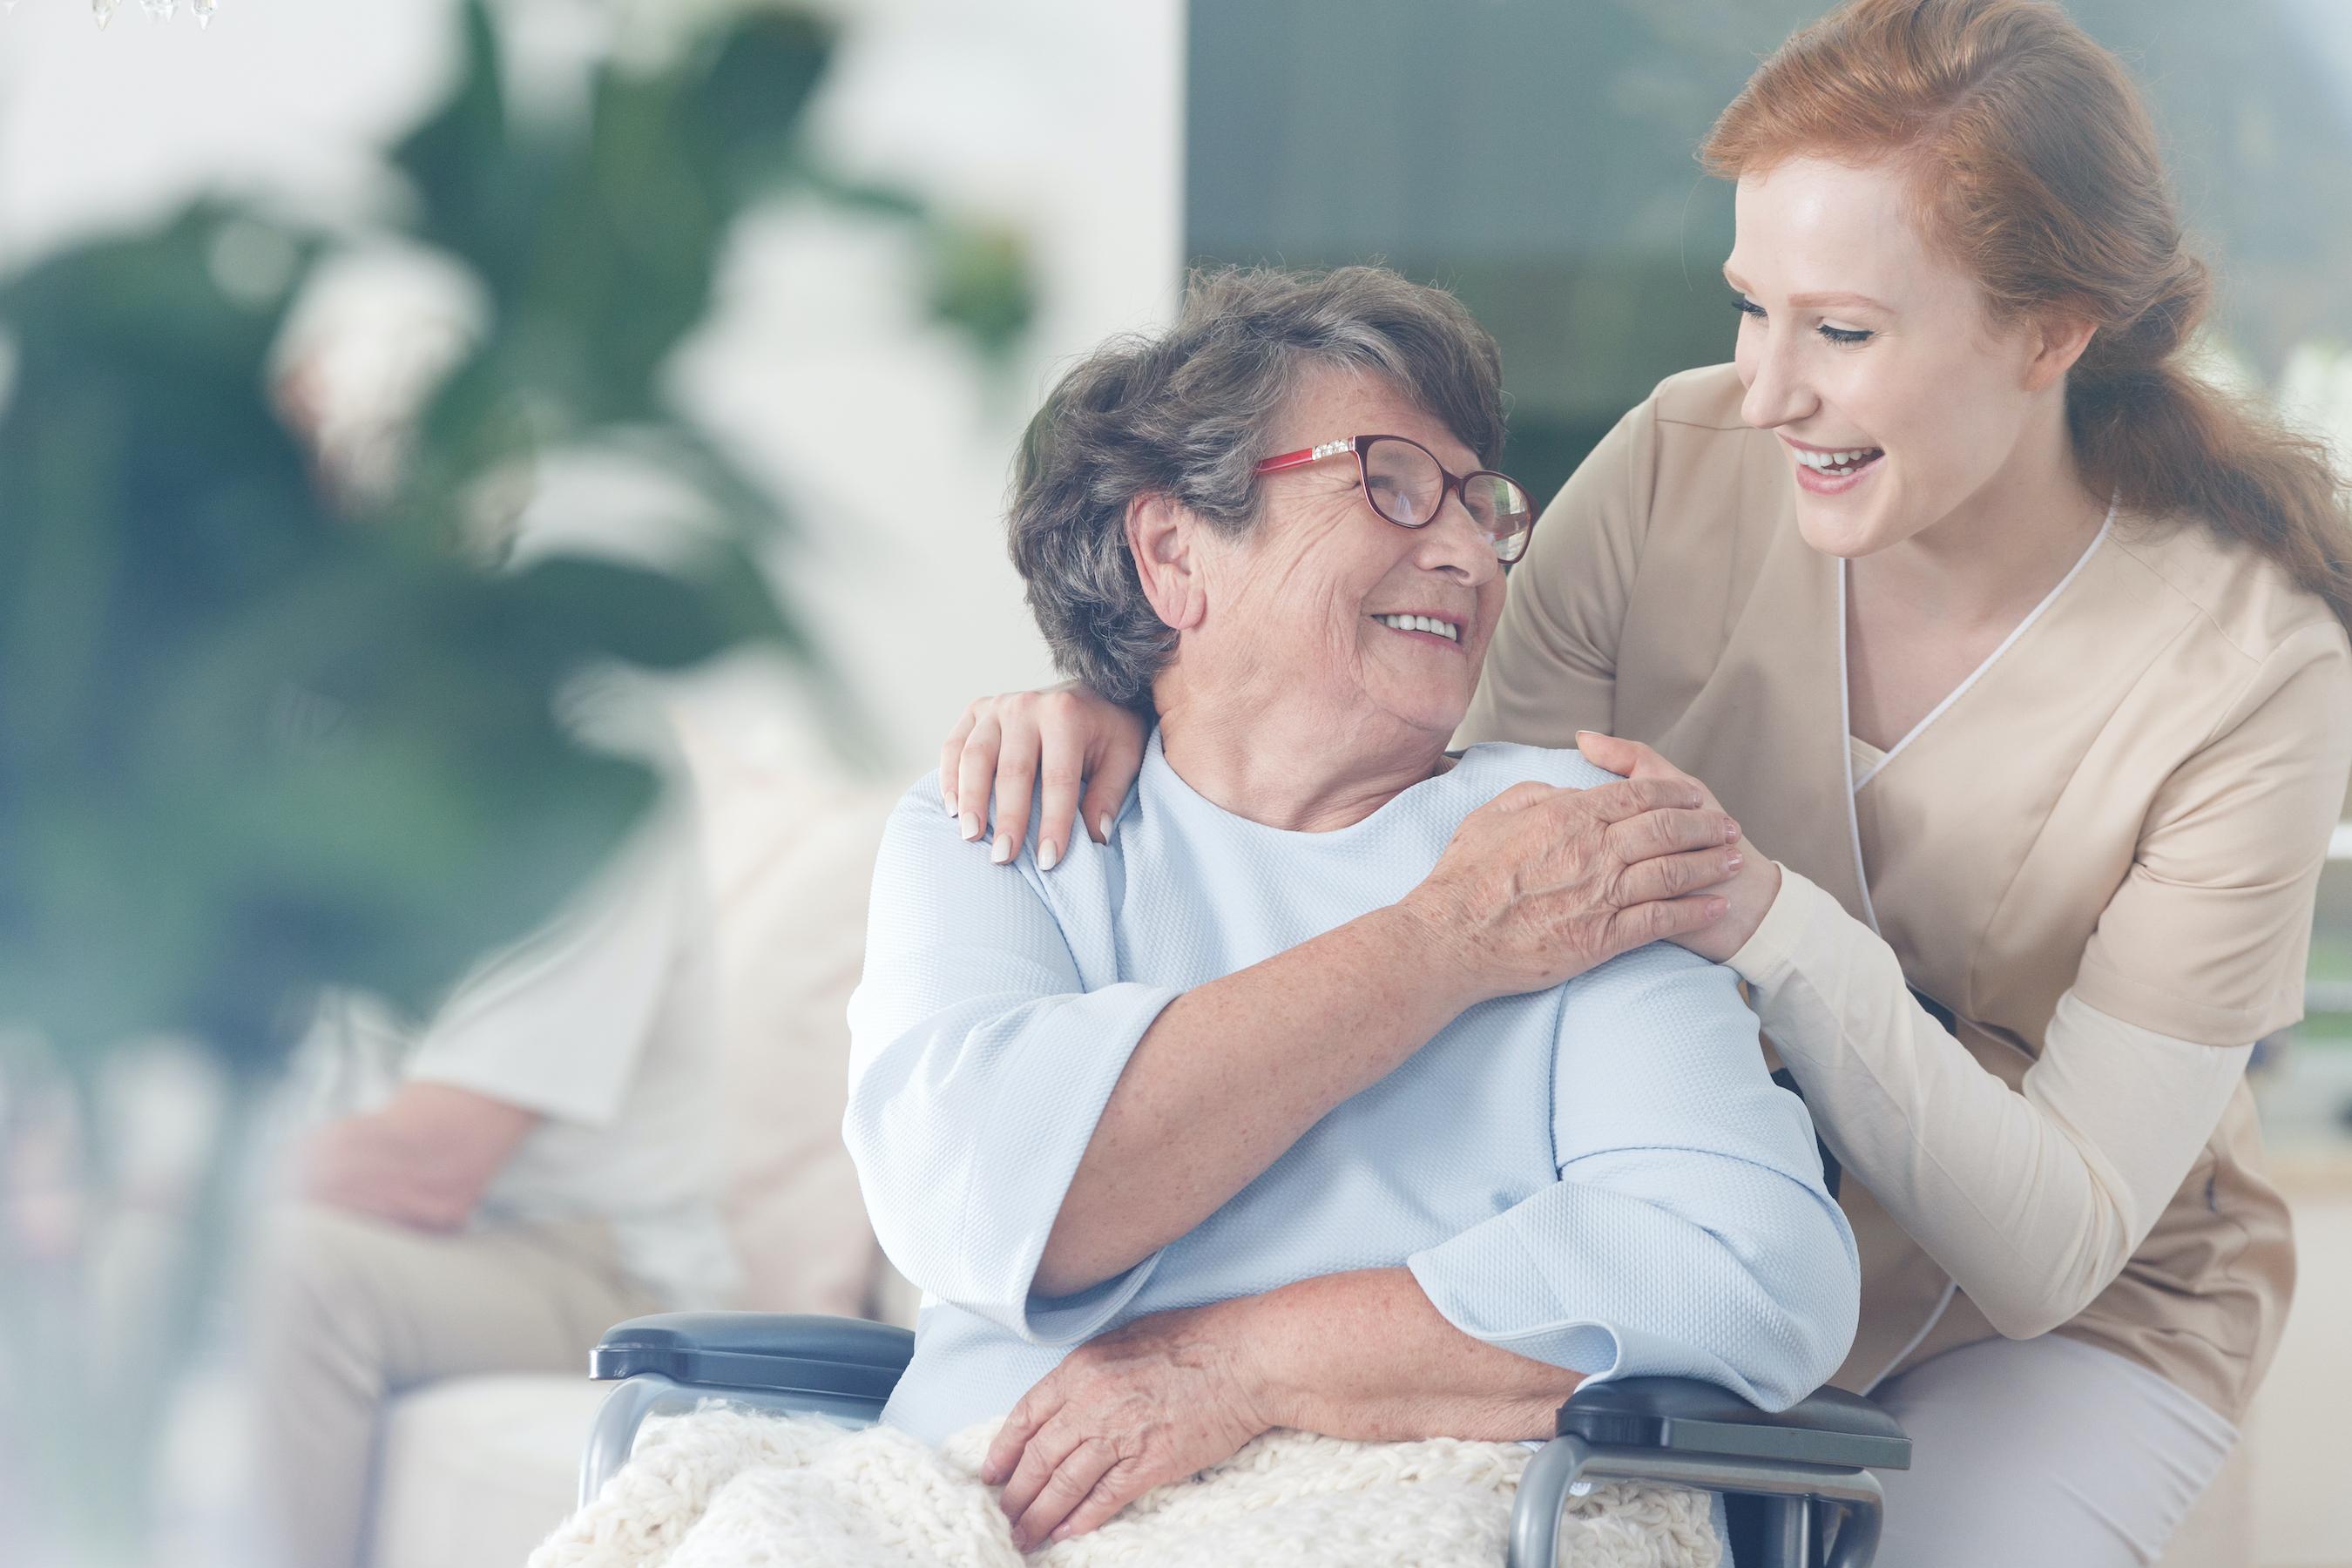 ARC Allocates $320,000 to Jewish Family & Career Services to Support Metro Atlanta Caregivers